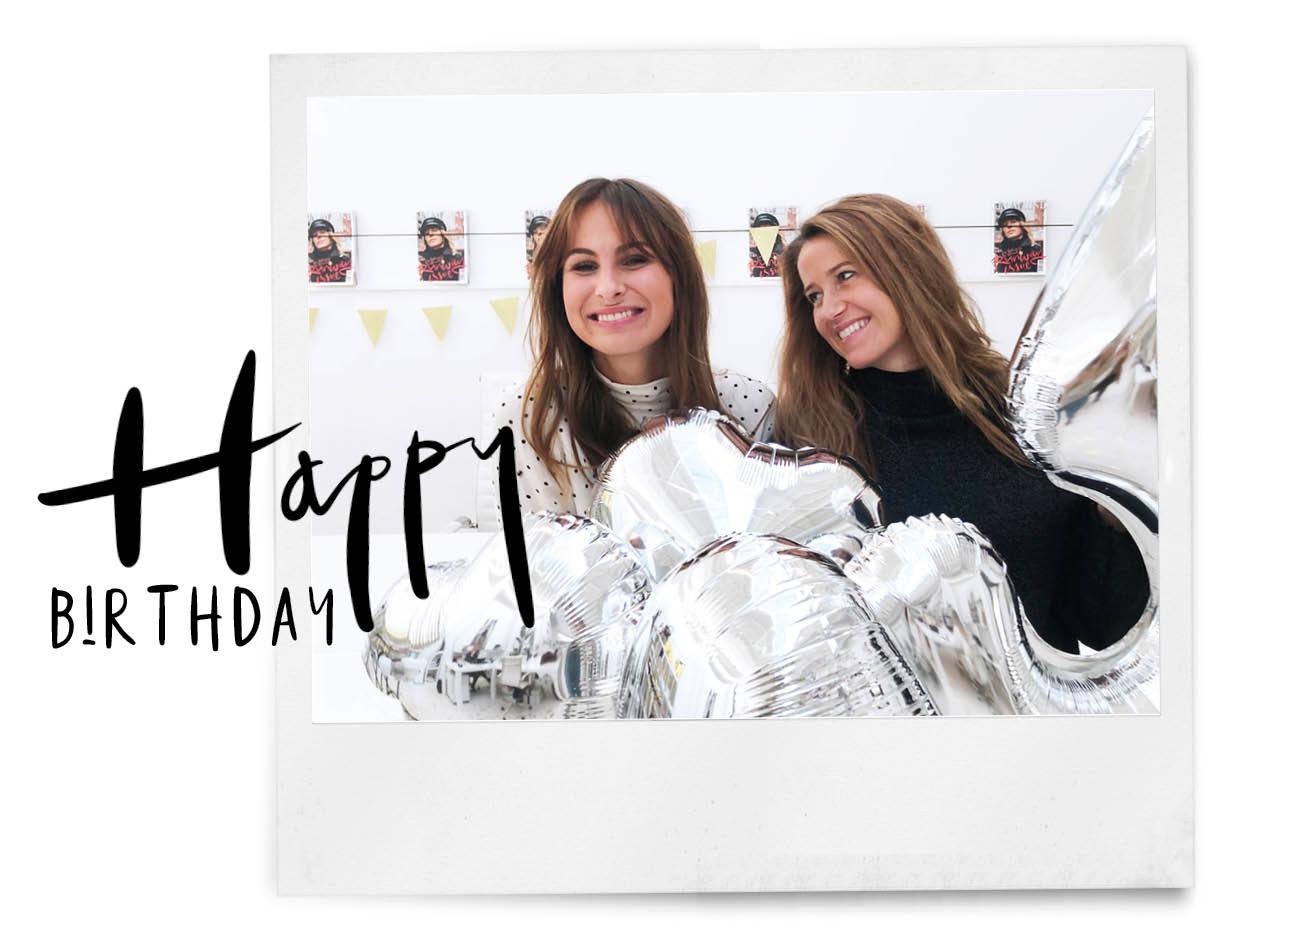 Tessa en Lilian samen met ballonen zilver